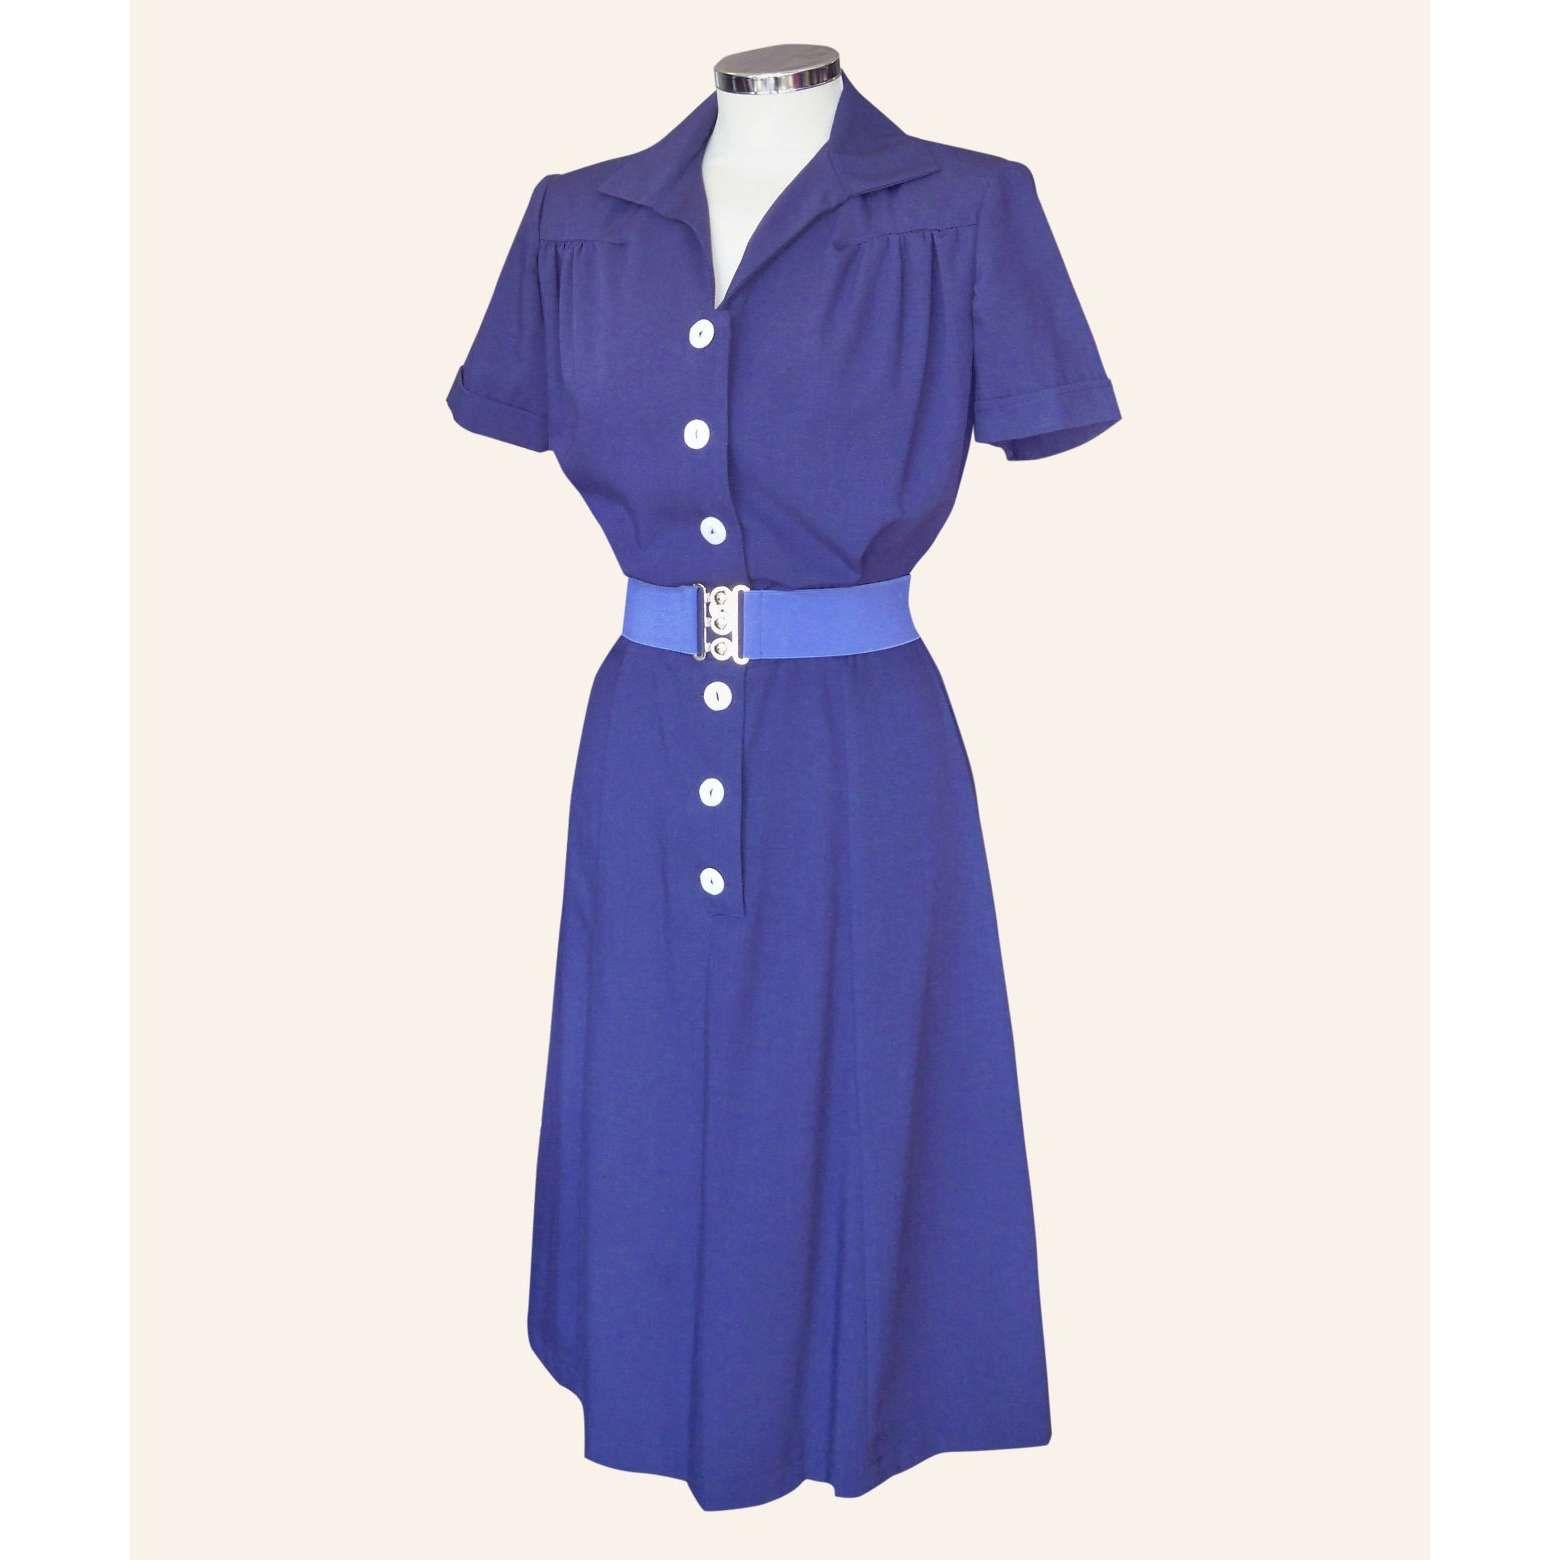 1940s dress | Vintaje año 1940 | Pinterest | Años